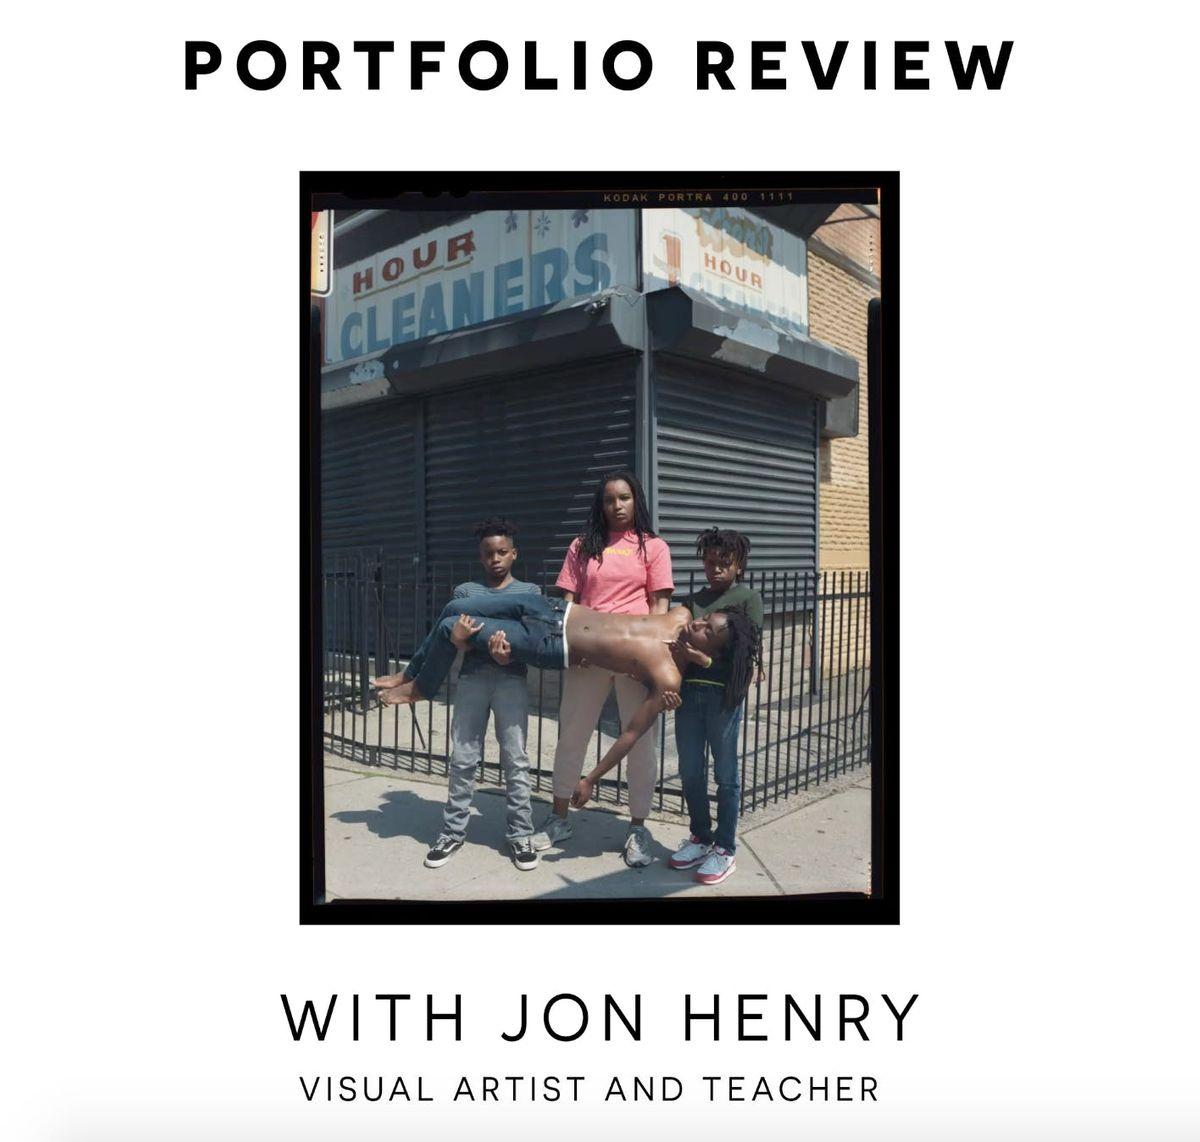 Portfolio Review with Jon Henry